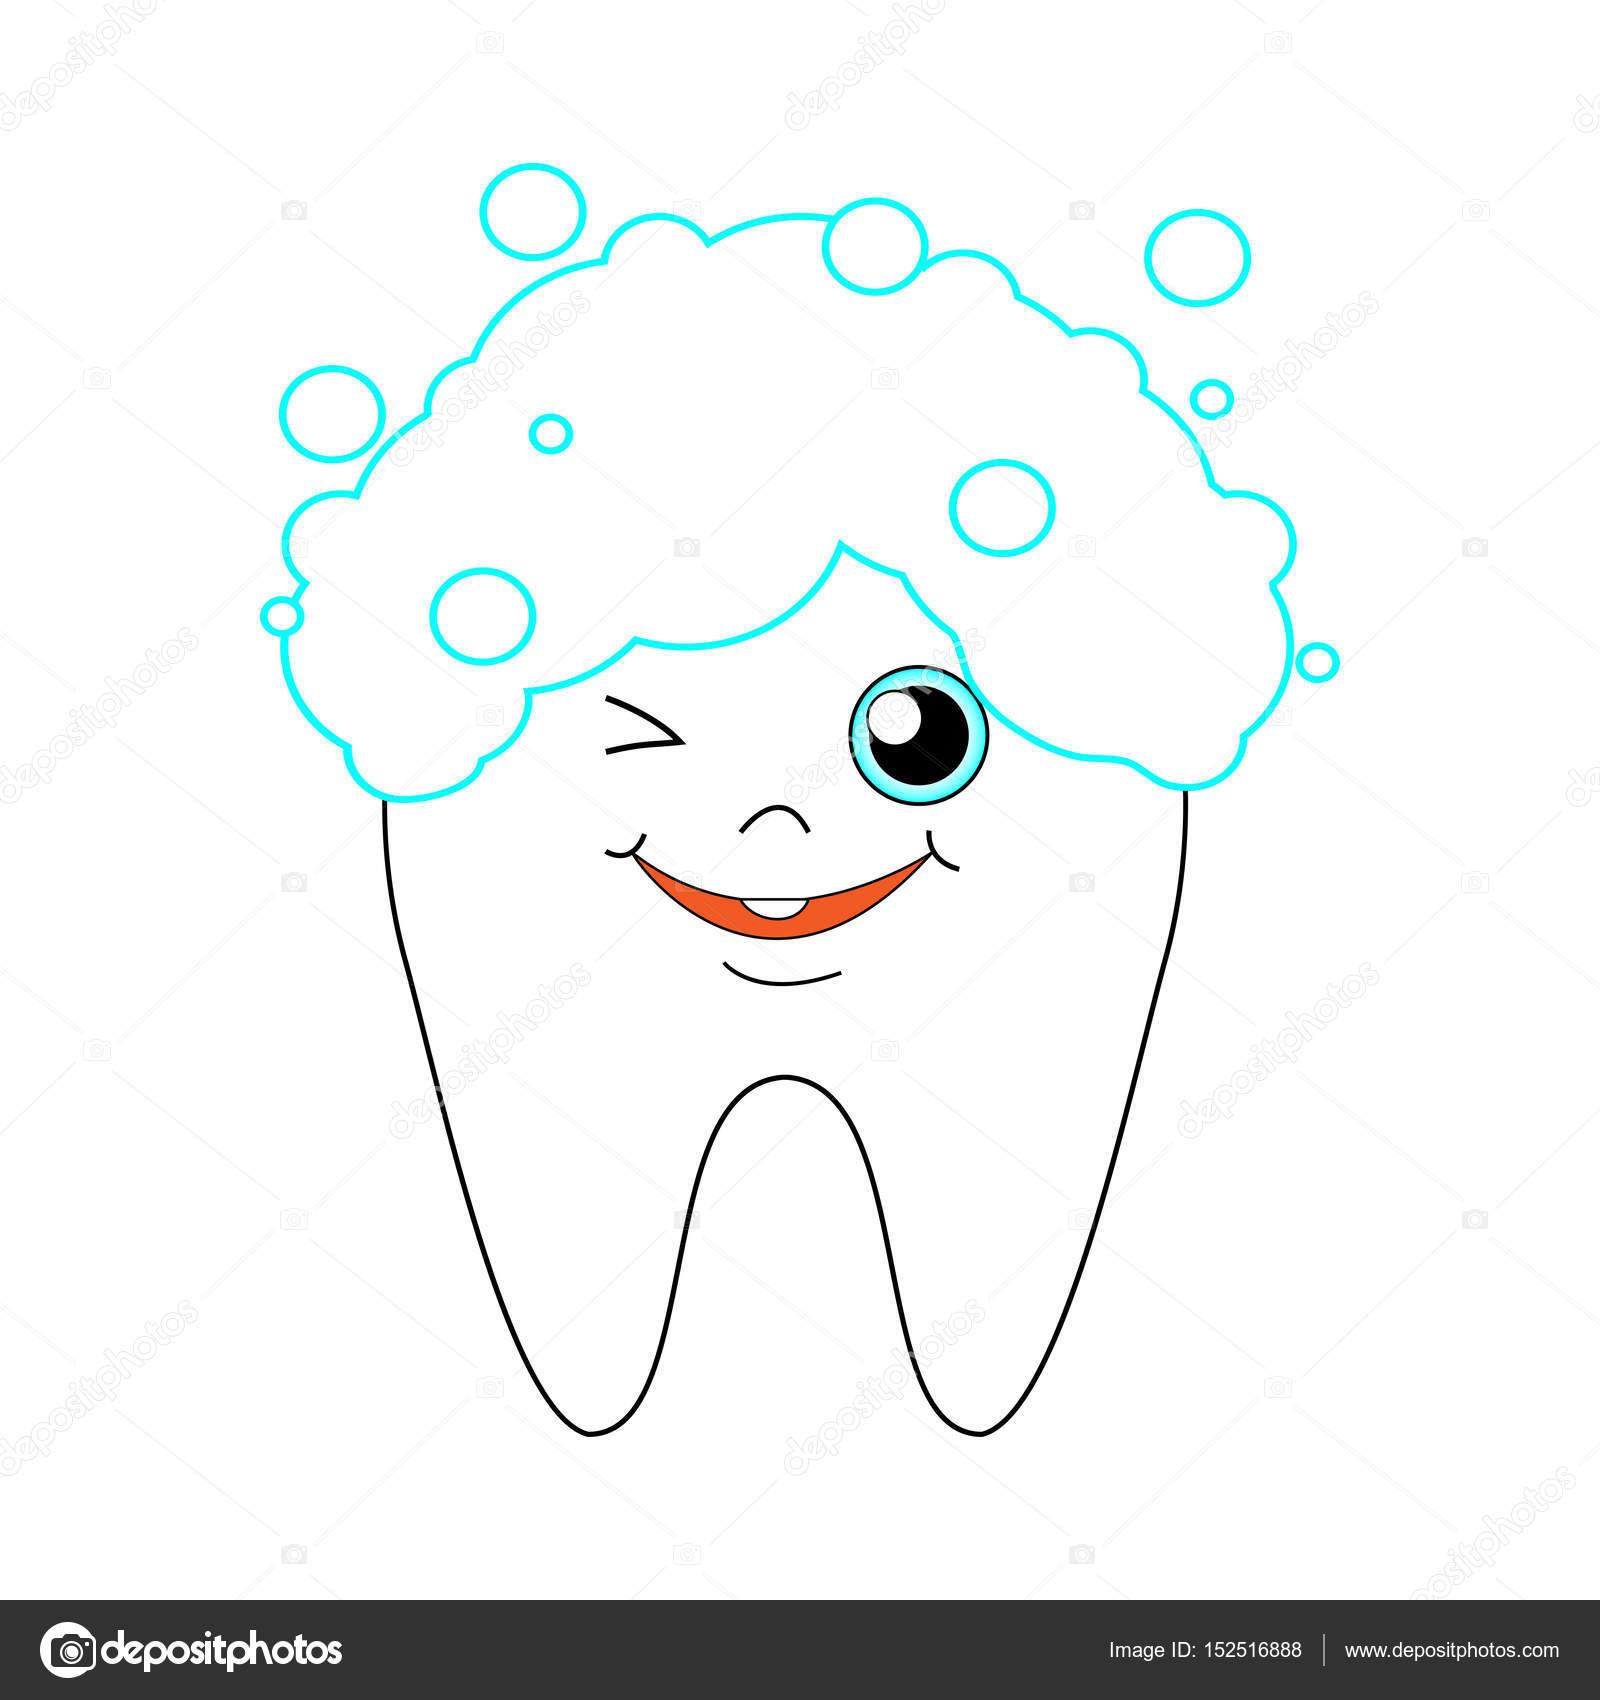 Dibujos Dentistas Para Pintar Vector De Dibujos Animados